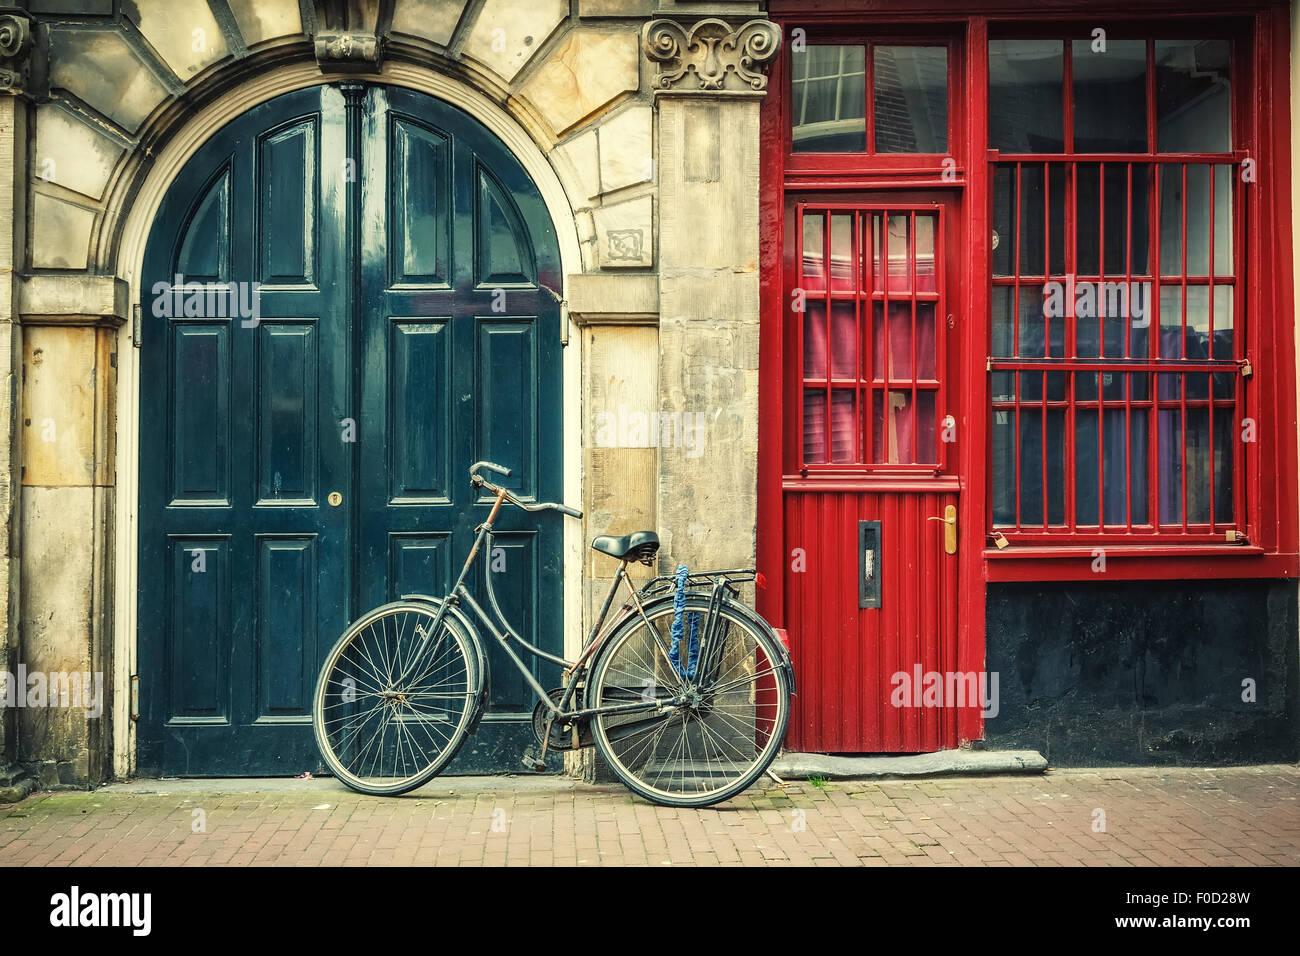 Location à Amsterdam Photo Stock